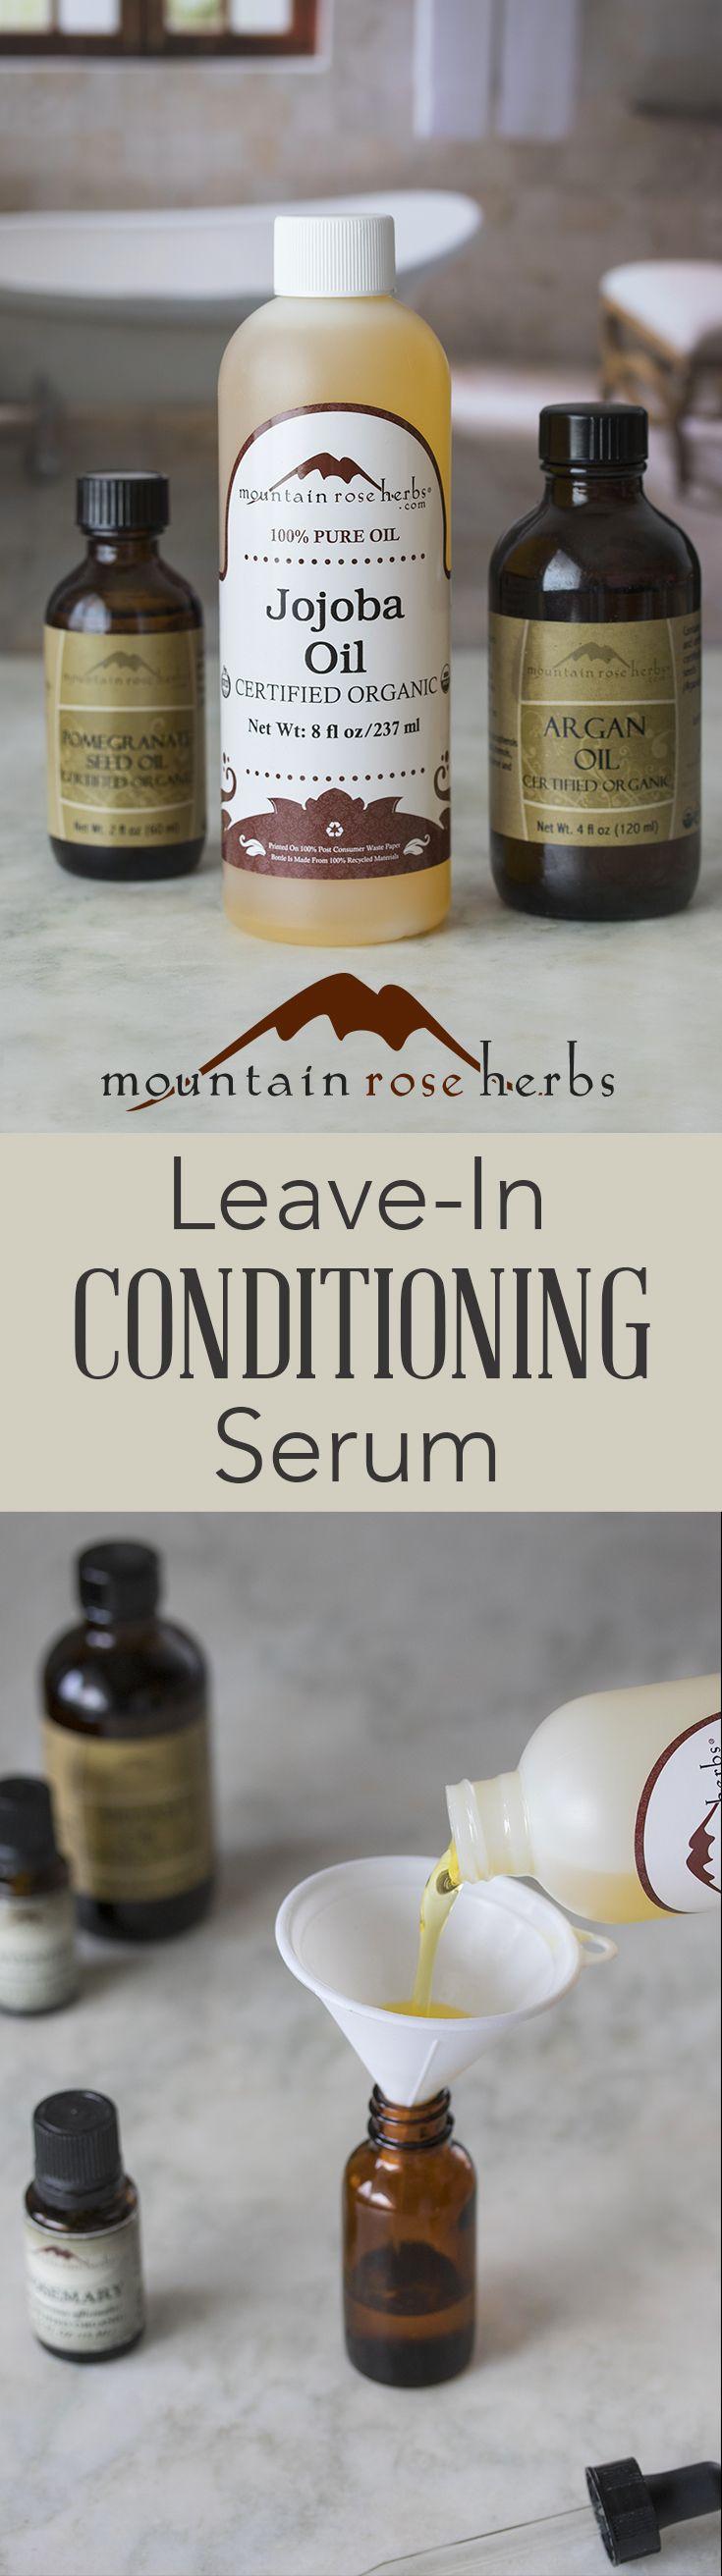 DIY Leavein Conditioner with Jojoba & Argan Oils Recipe